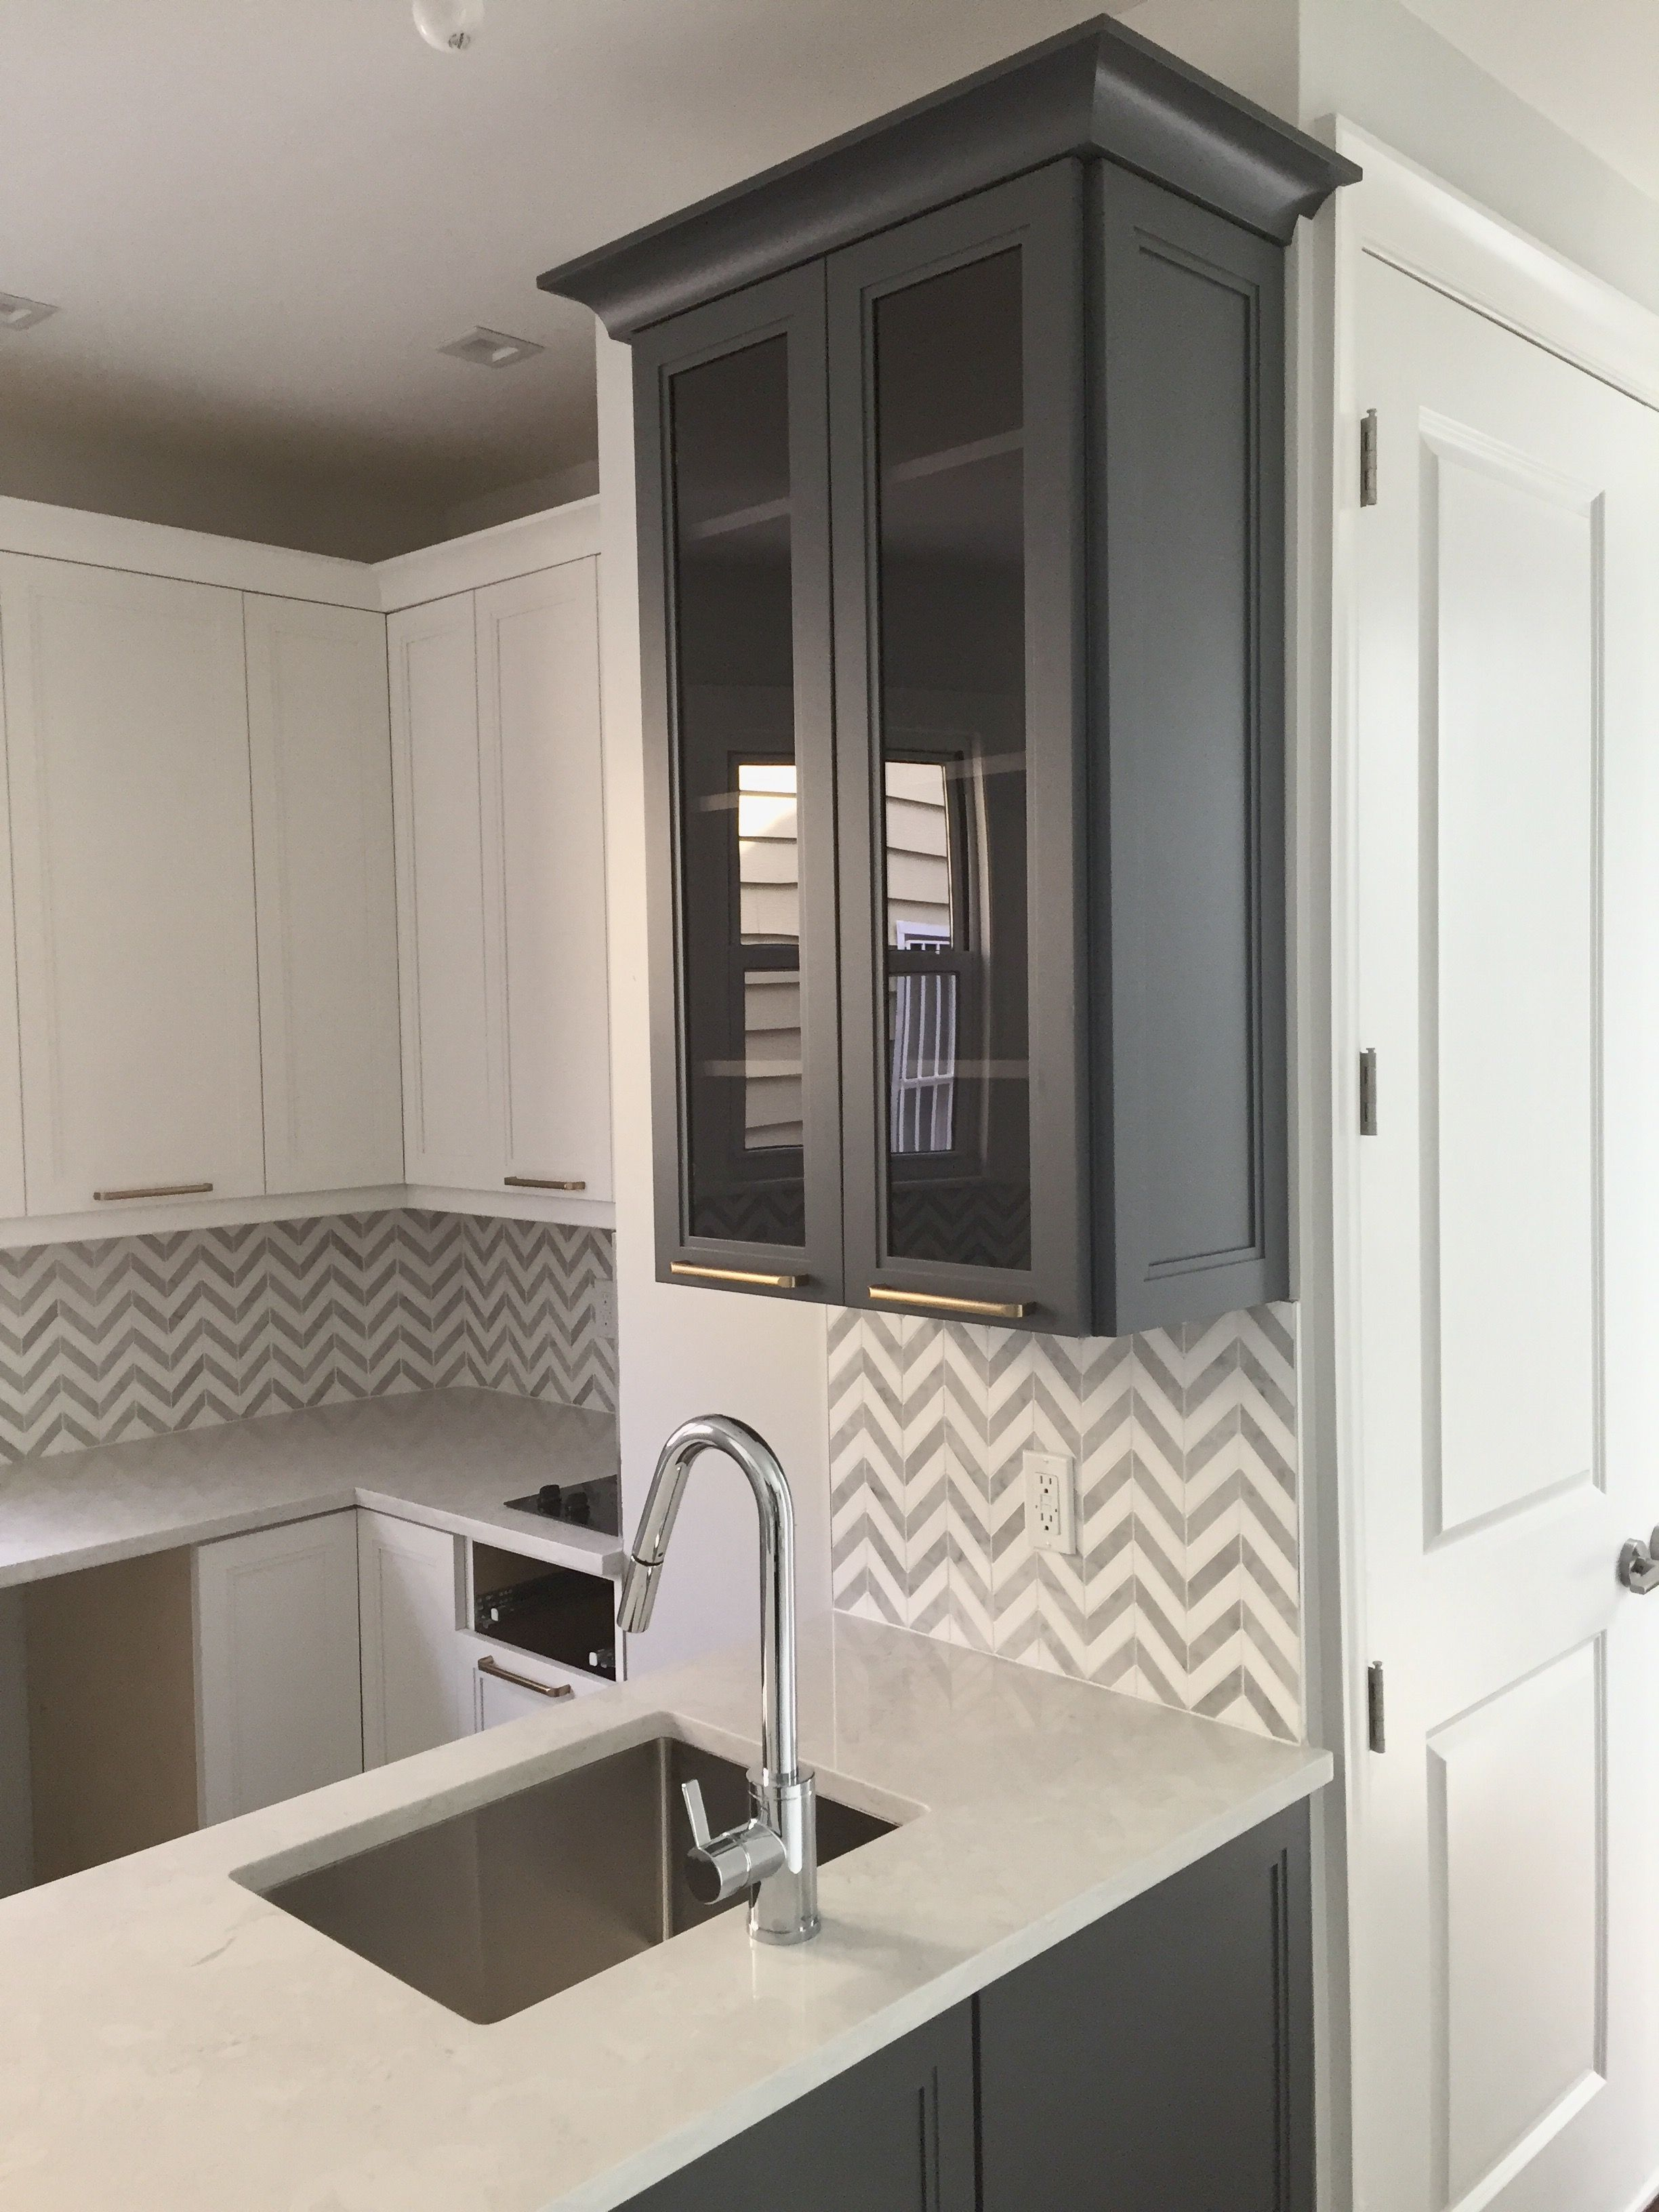 A Pop Of Color For A White Kitchen Whitekitchencabinets Kitchenideas Hanssem Quartzcountertops Topknobs Kitchen Cabinet Design Kitchen Cabinets Kitchen